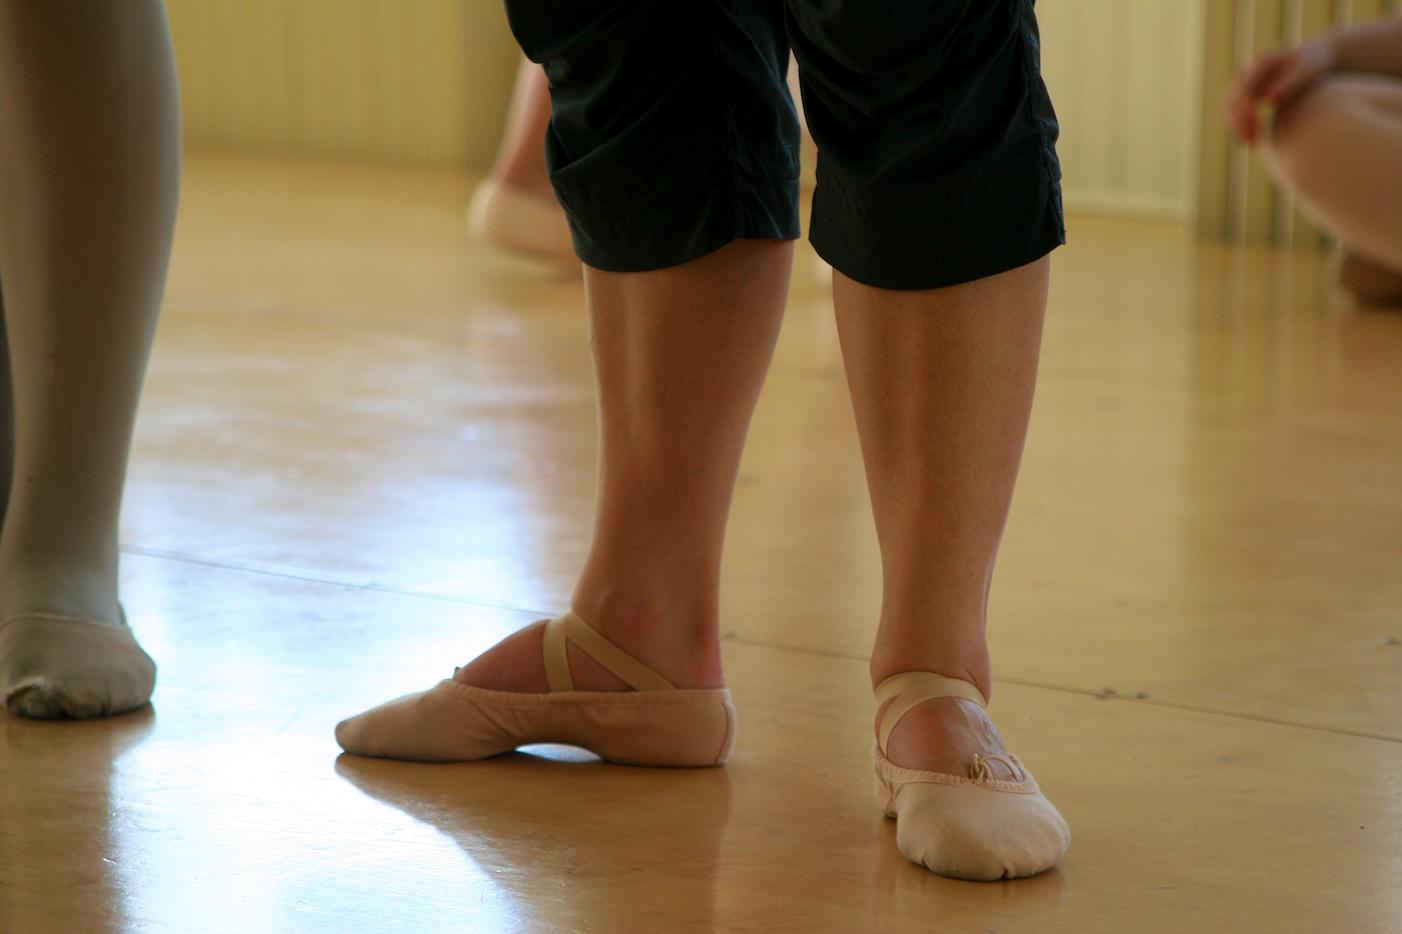 diana's feet